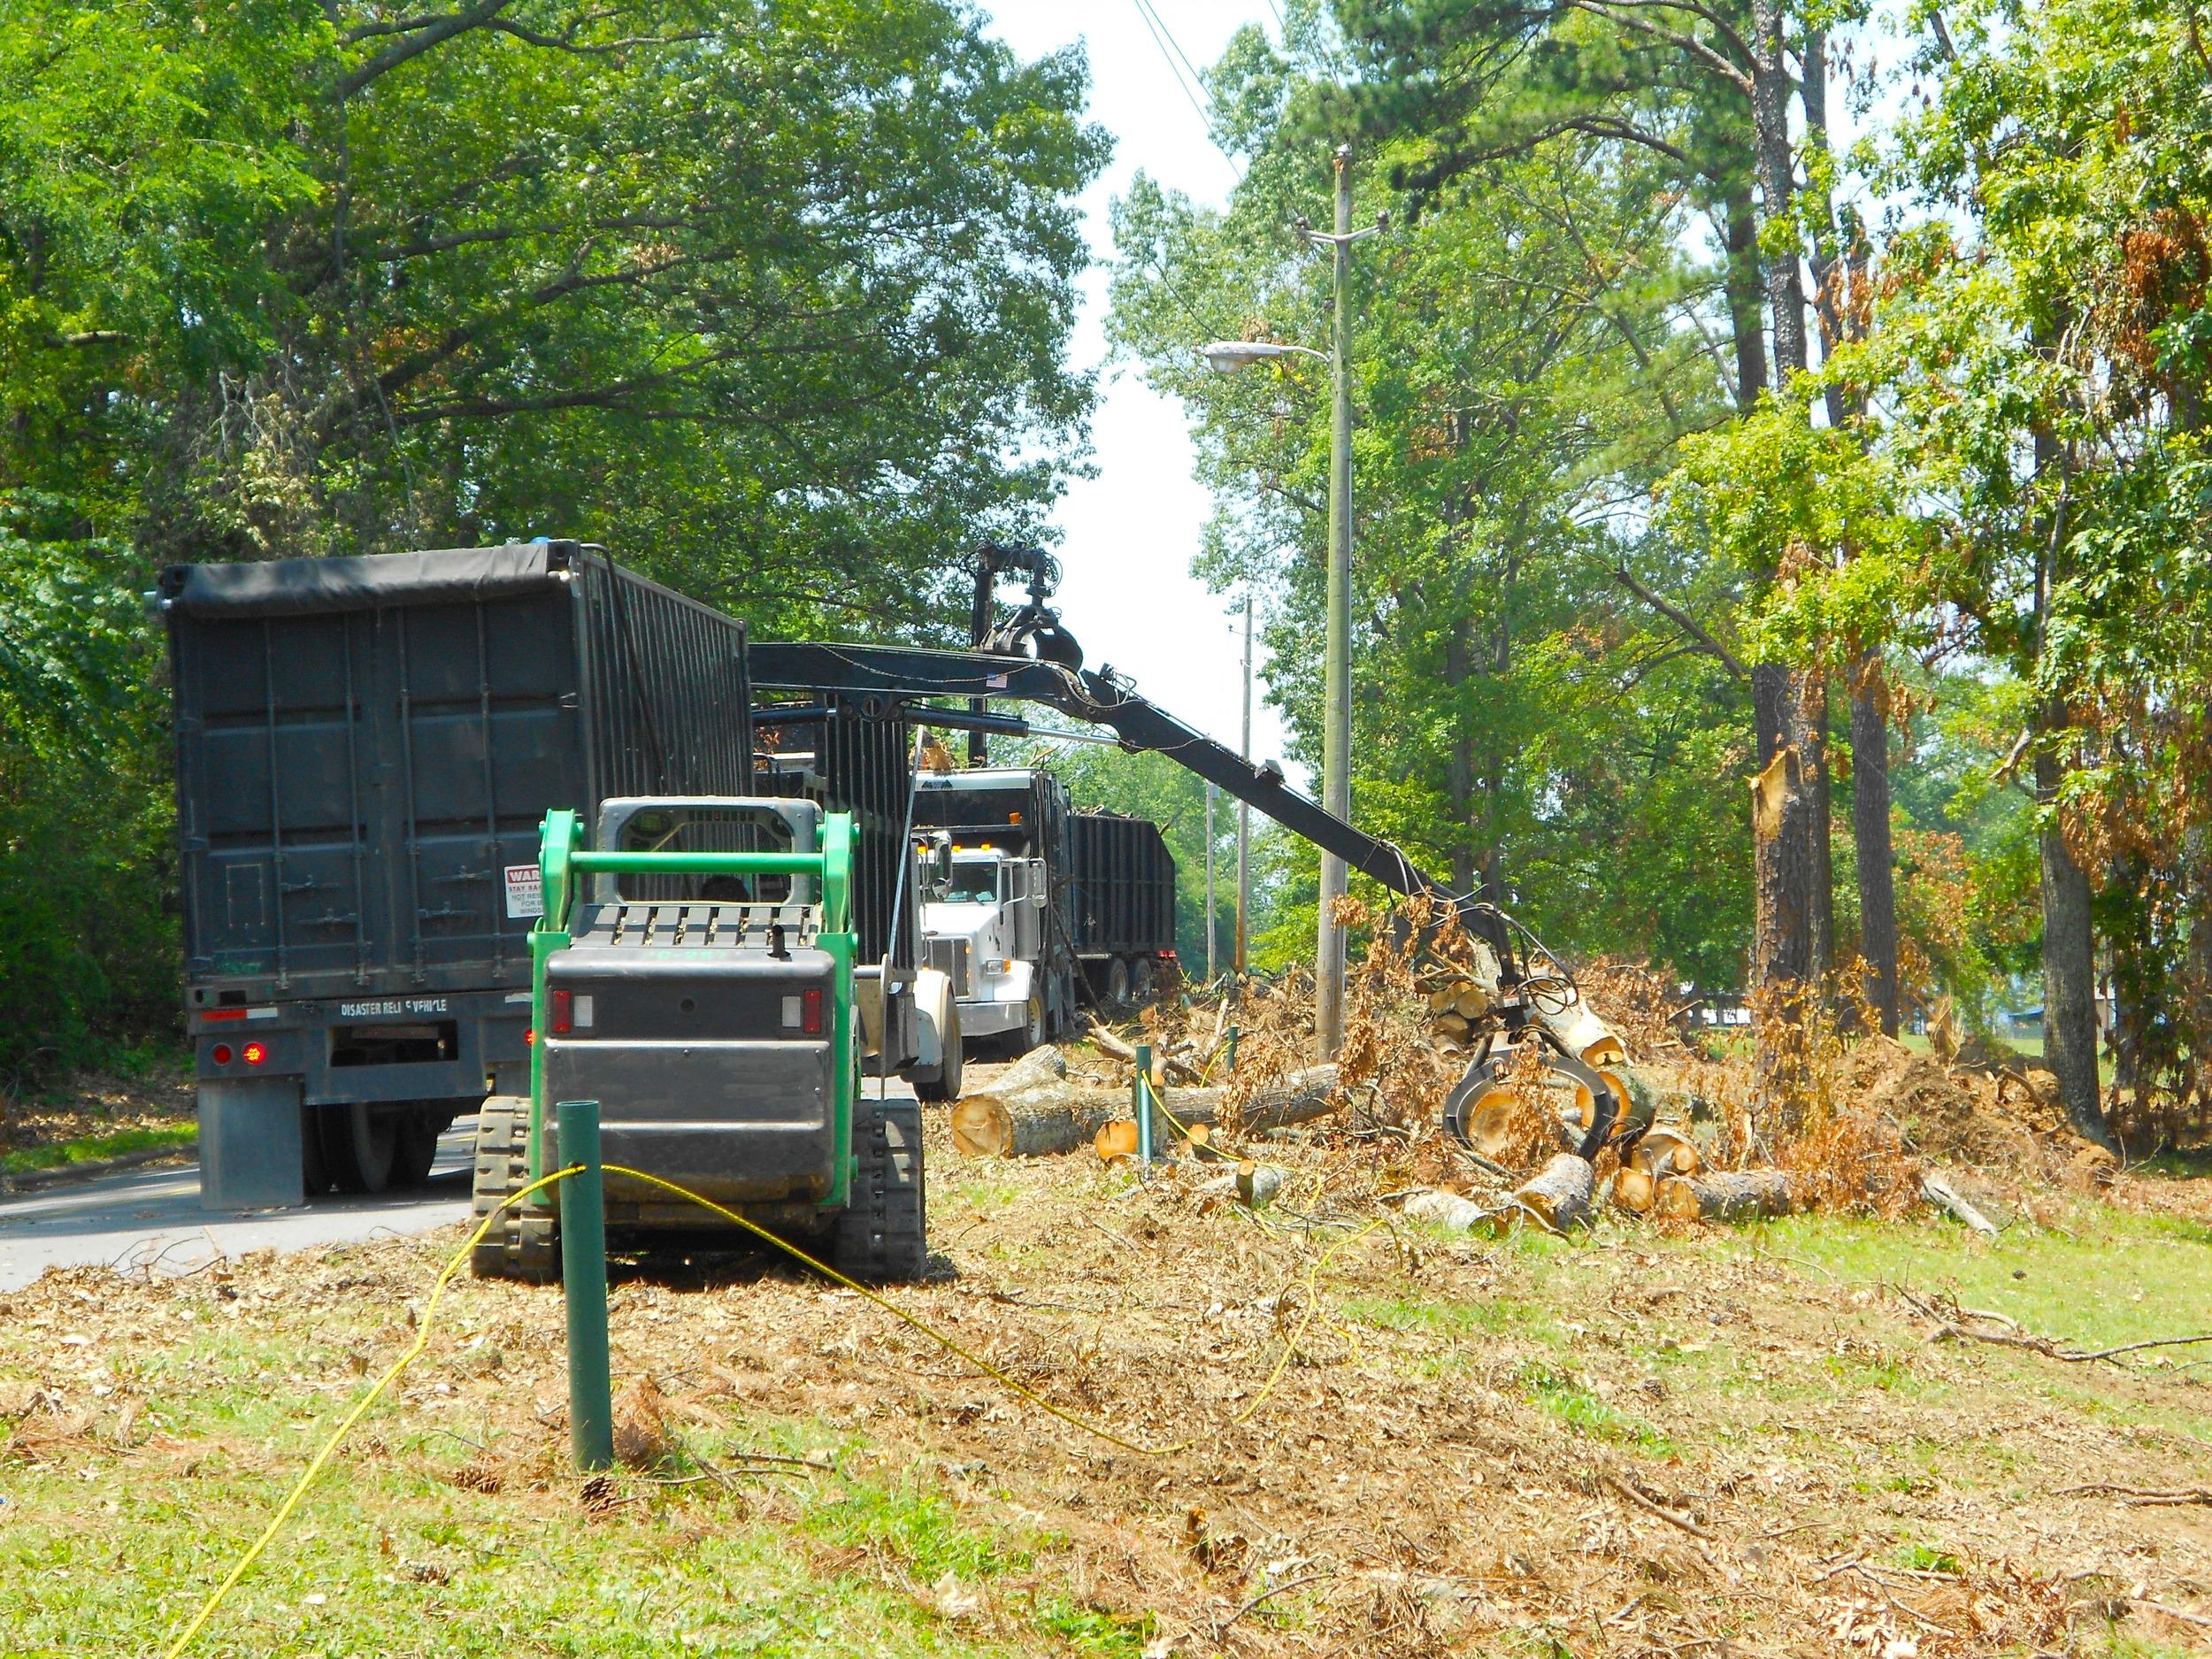 Alabama Tornado_2 copy.jpg